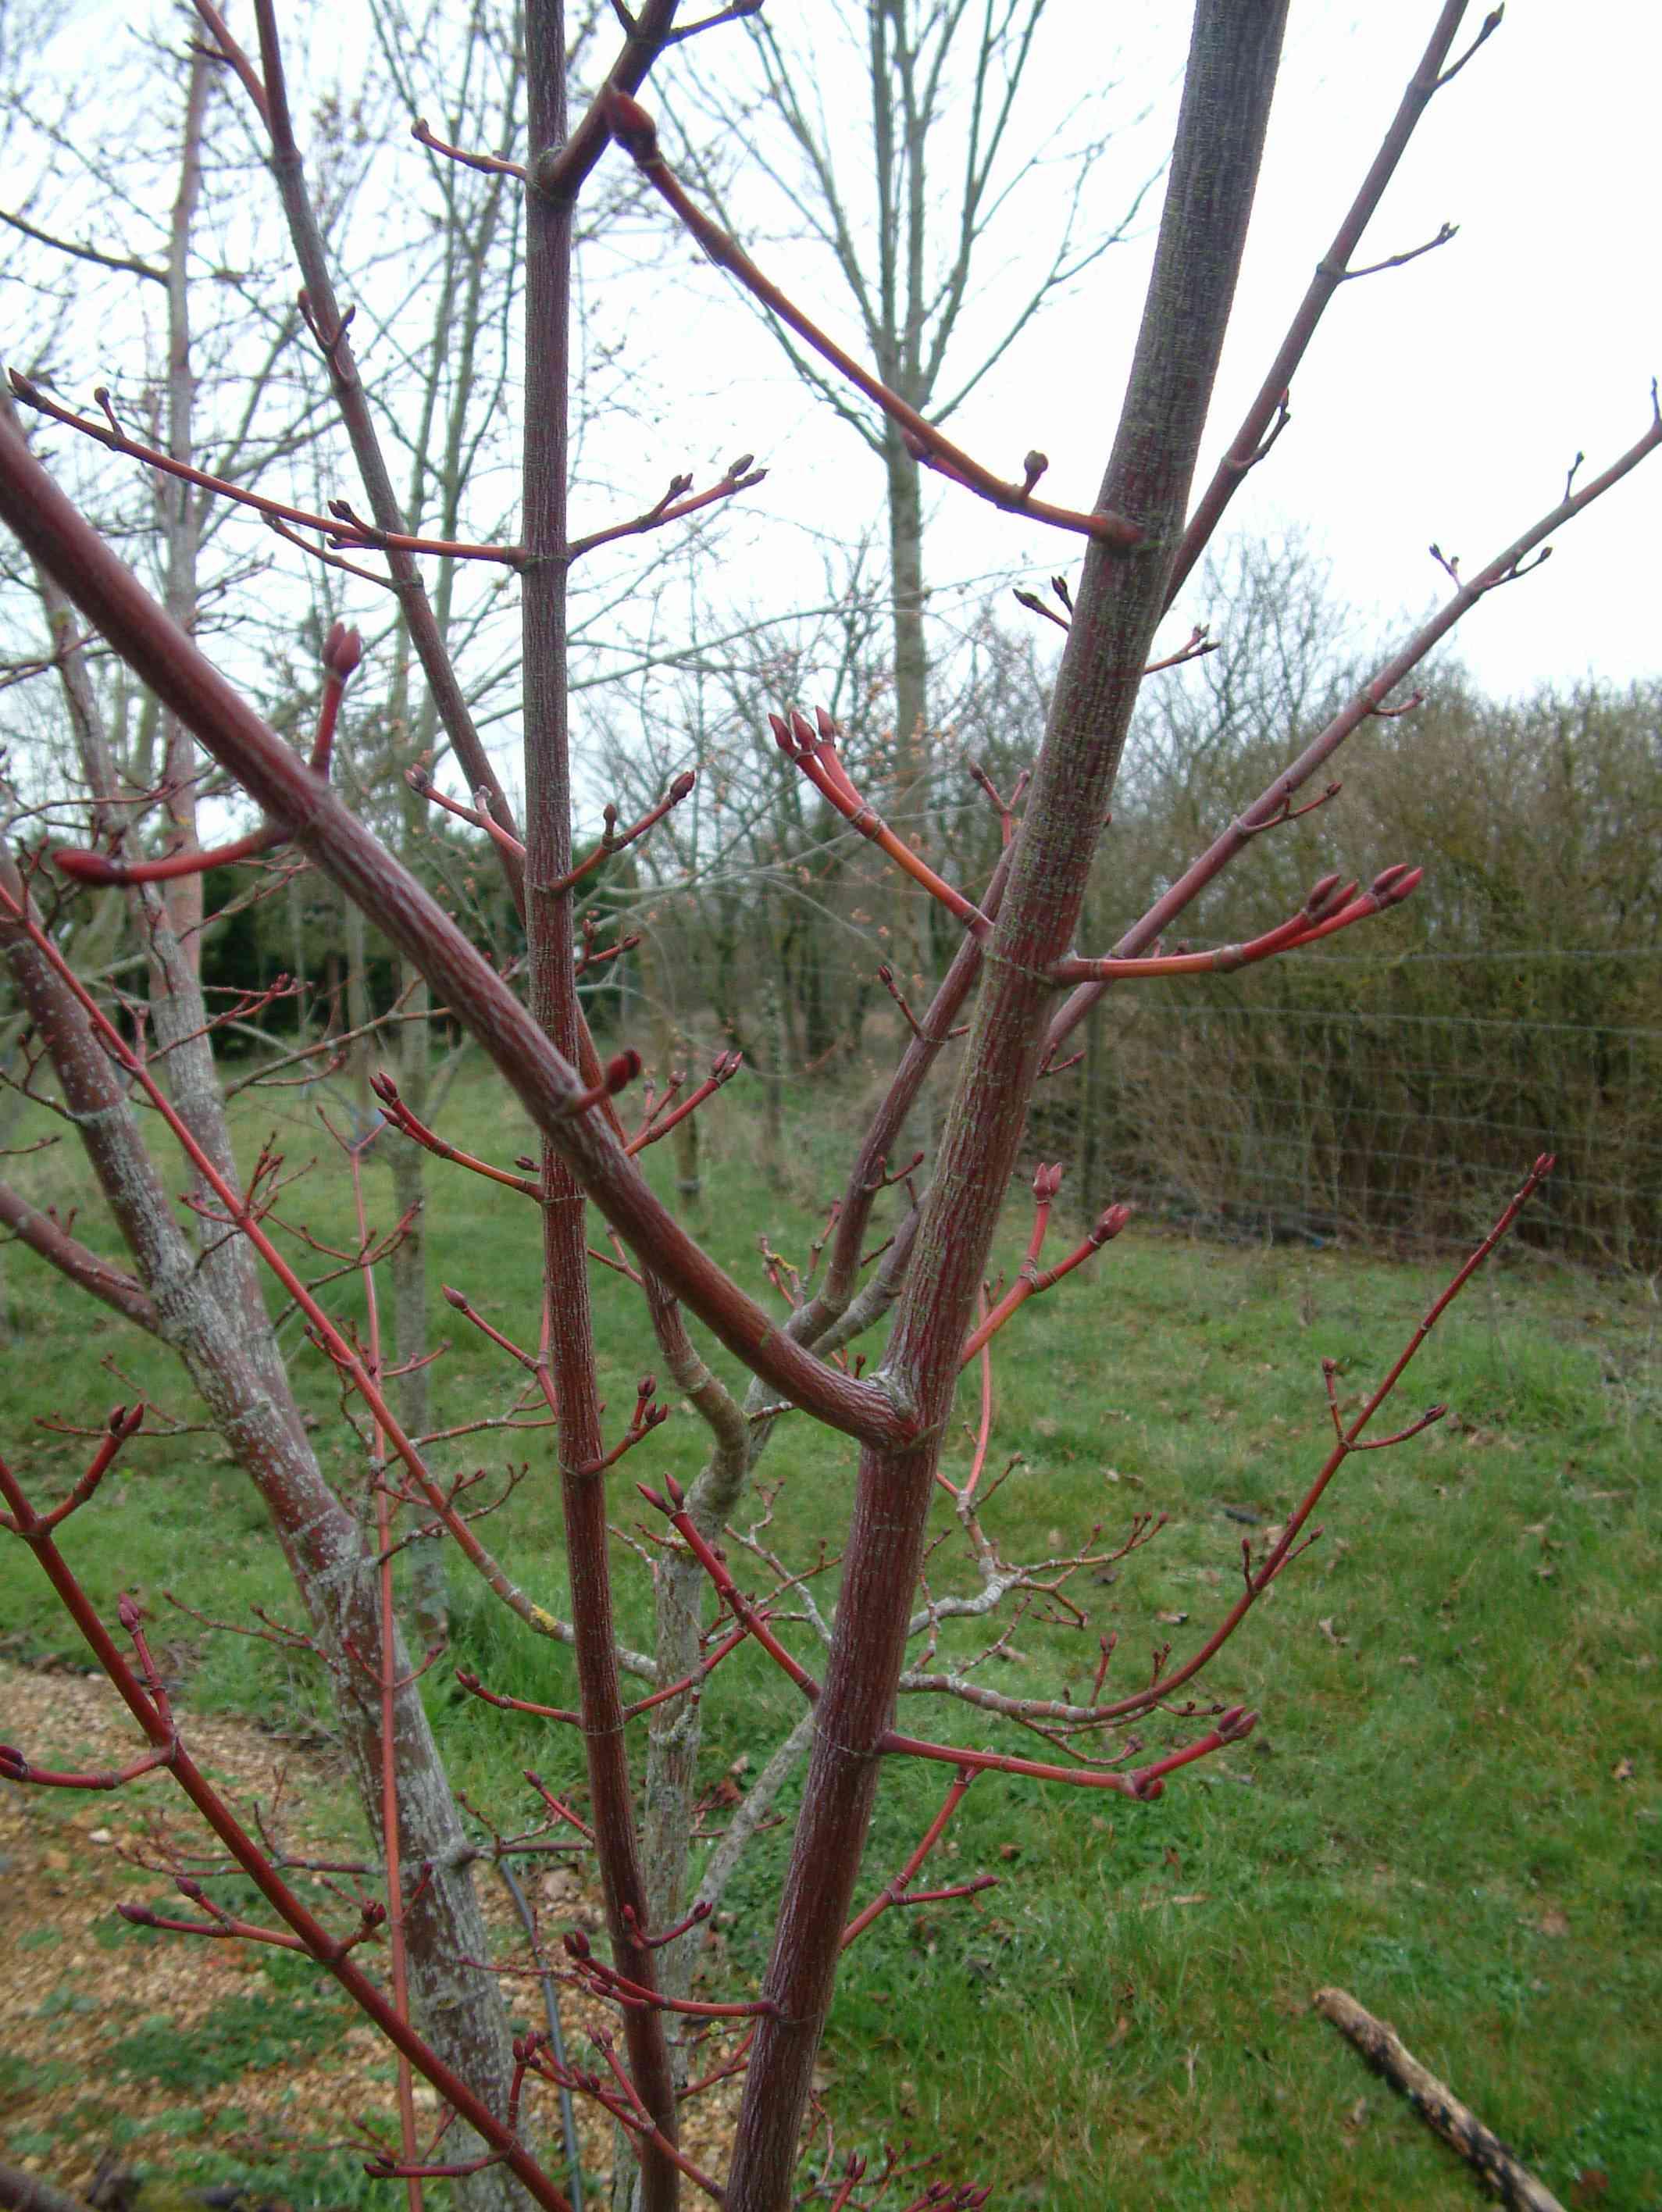 Acer X Conspicuum 'silver Vein' (Sujet) Aceraceae